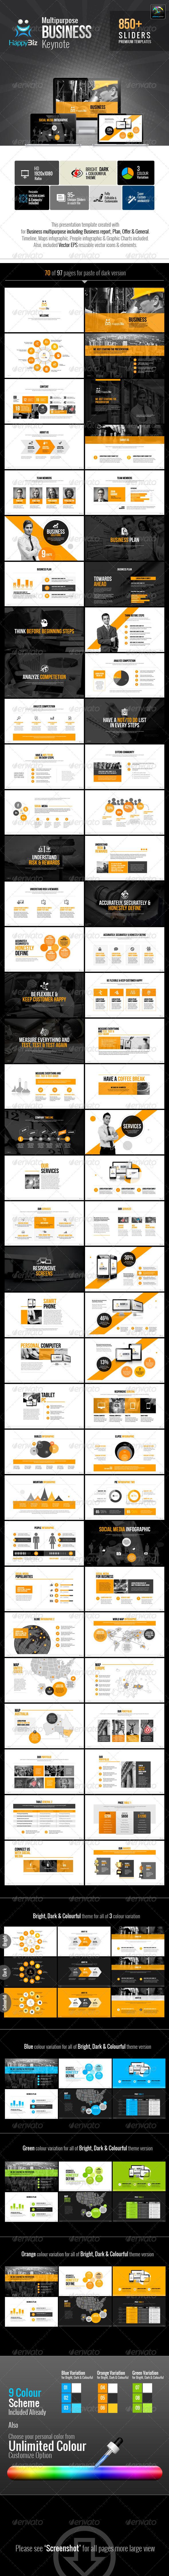 GraphicRiver HappyBiz Multipurpose Keynote 6636178